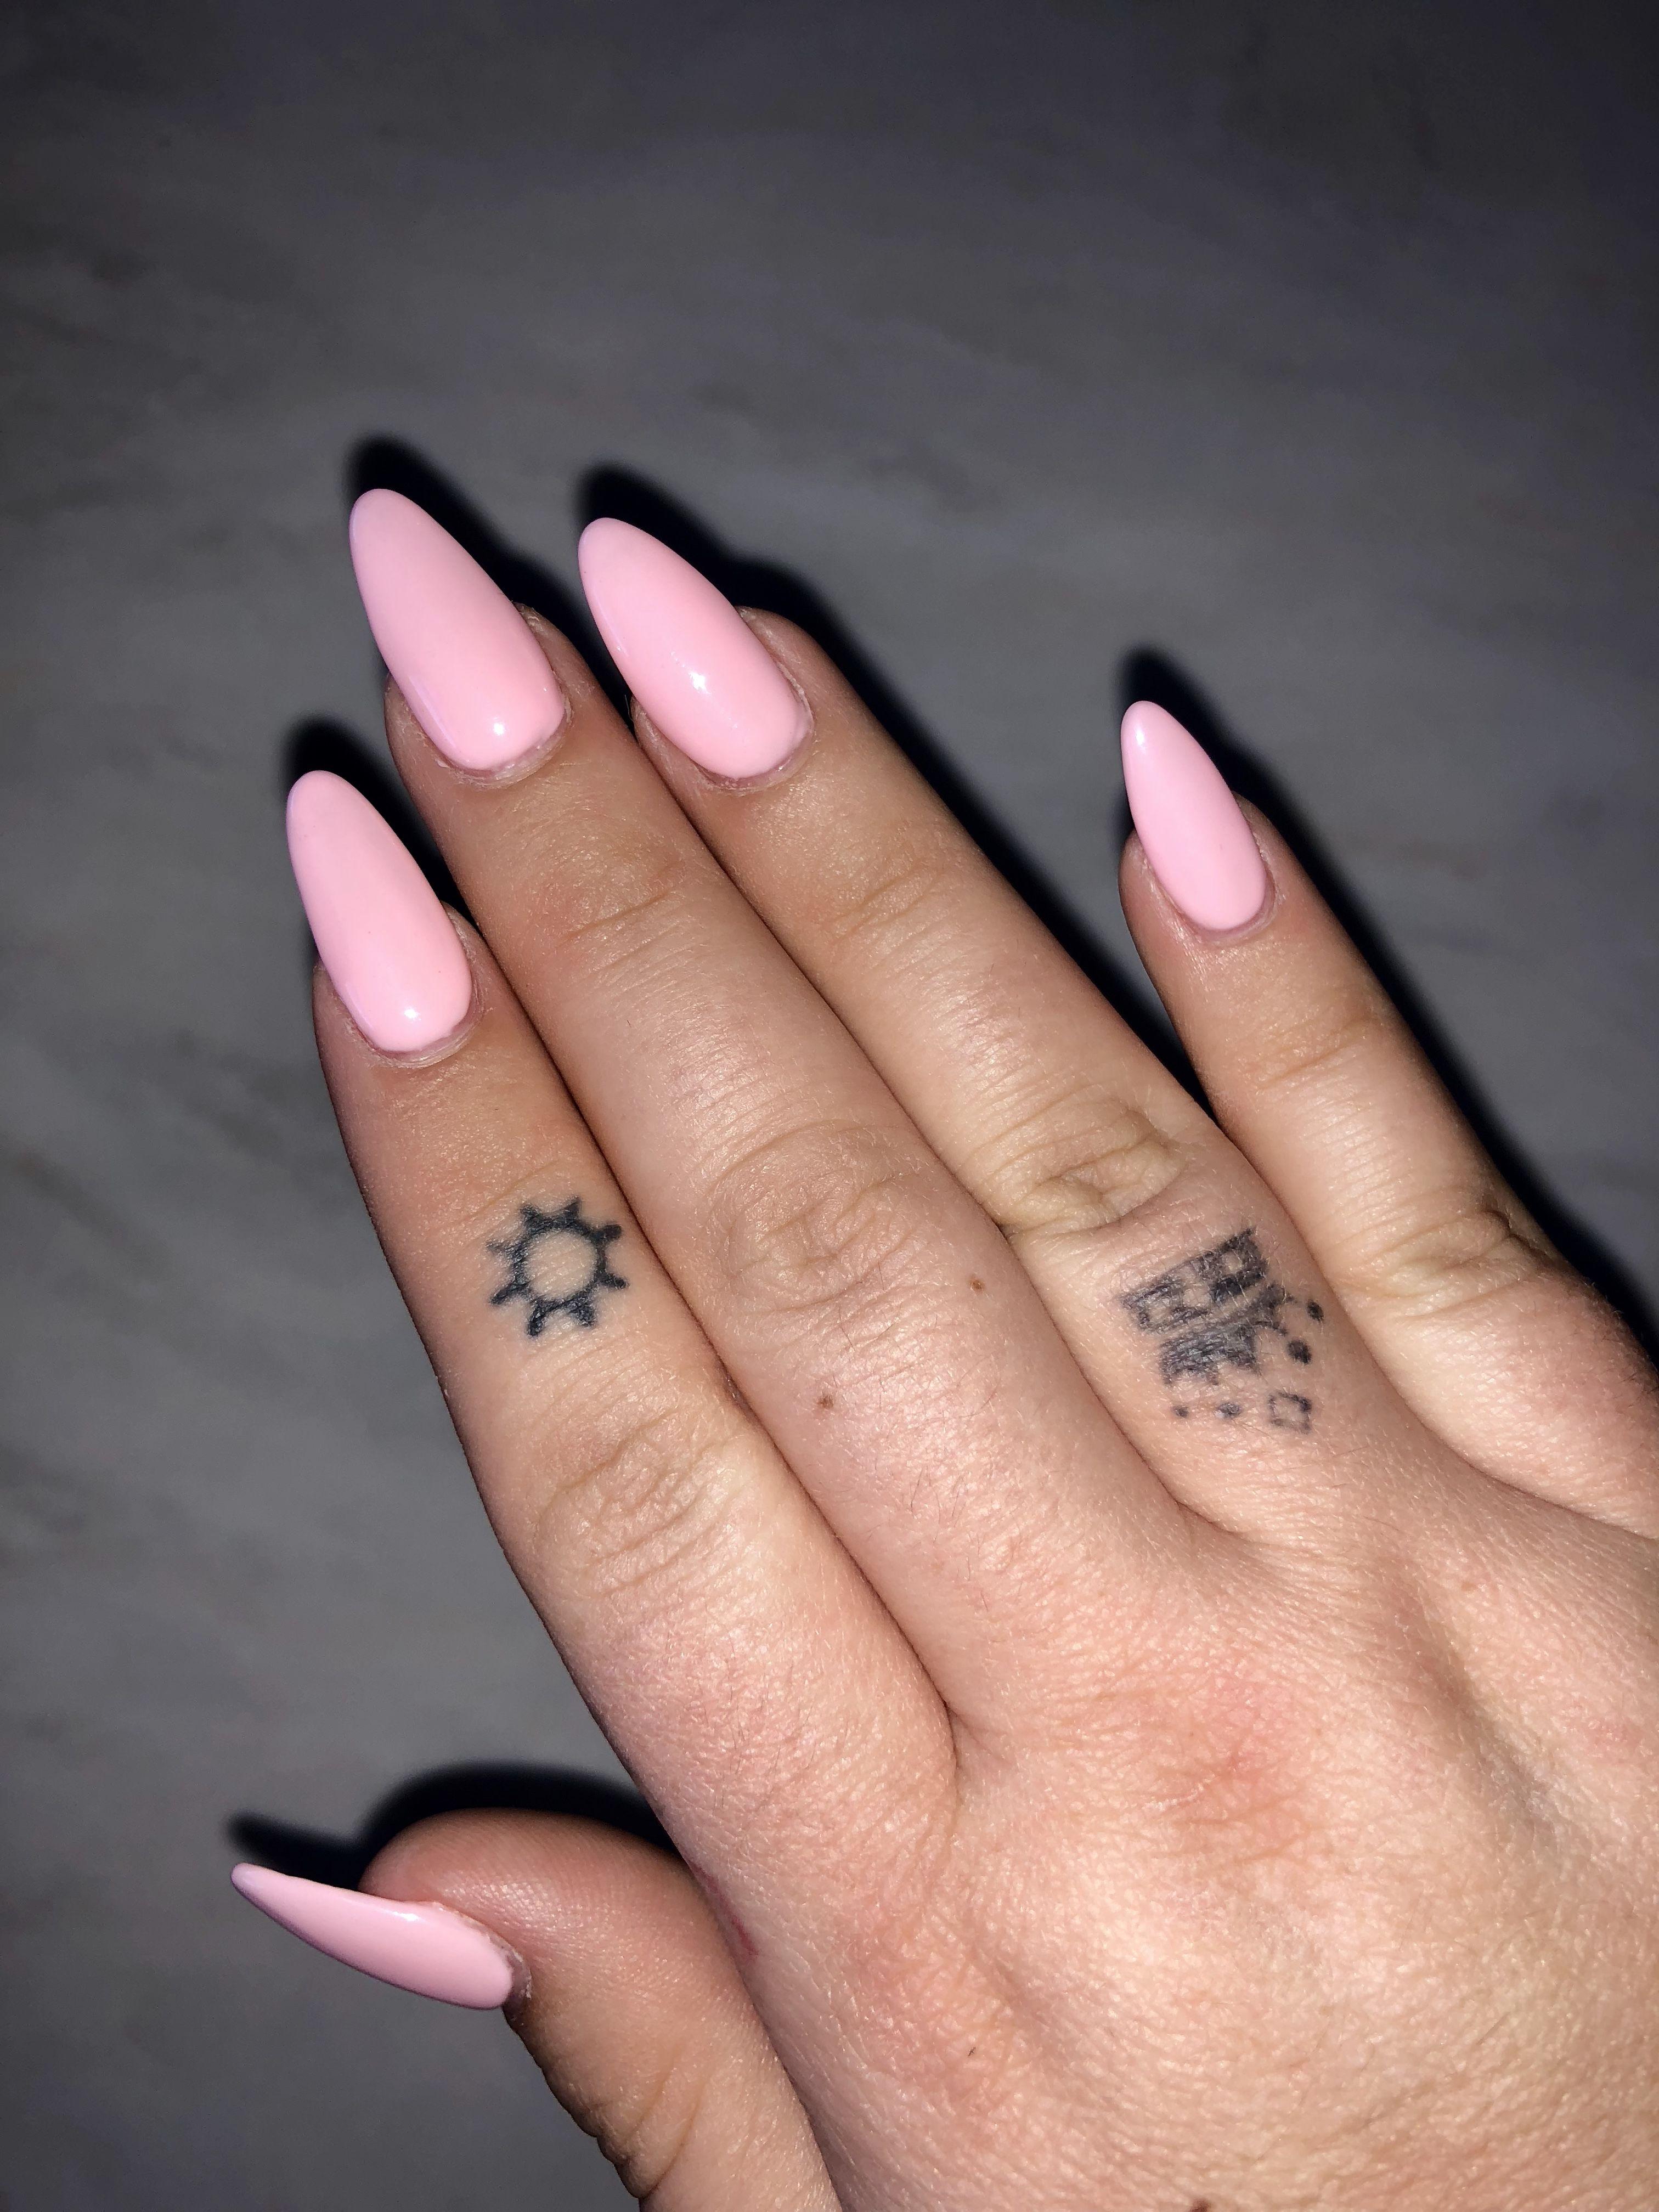 Pastel Pink Almond Nails Pink Acrylic Nails Acrylic Nails Almond Short Acrylic Nails Pastel